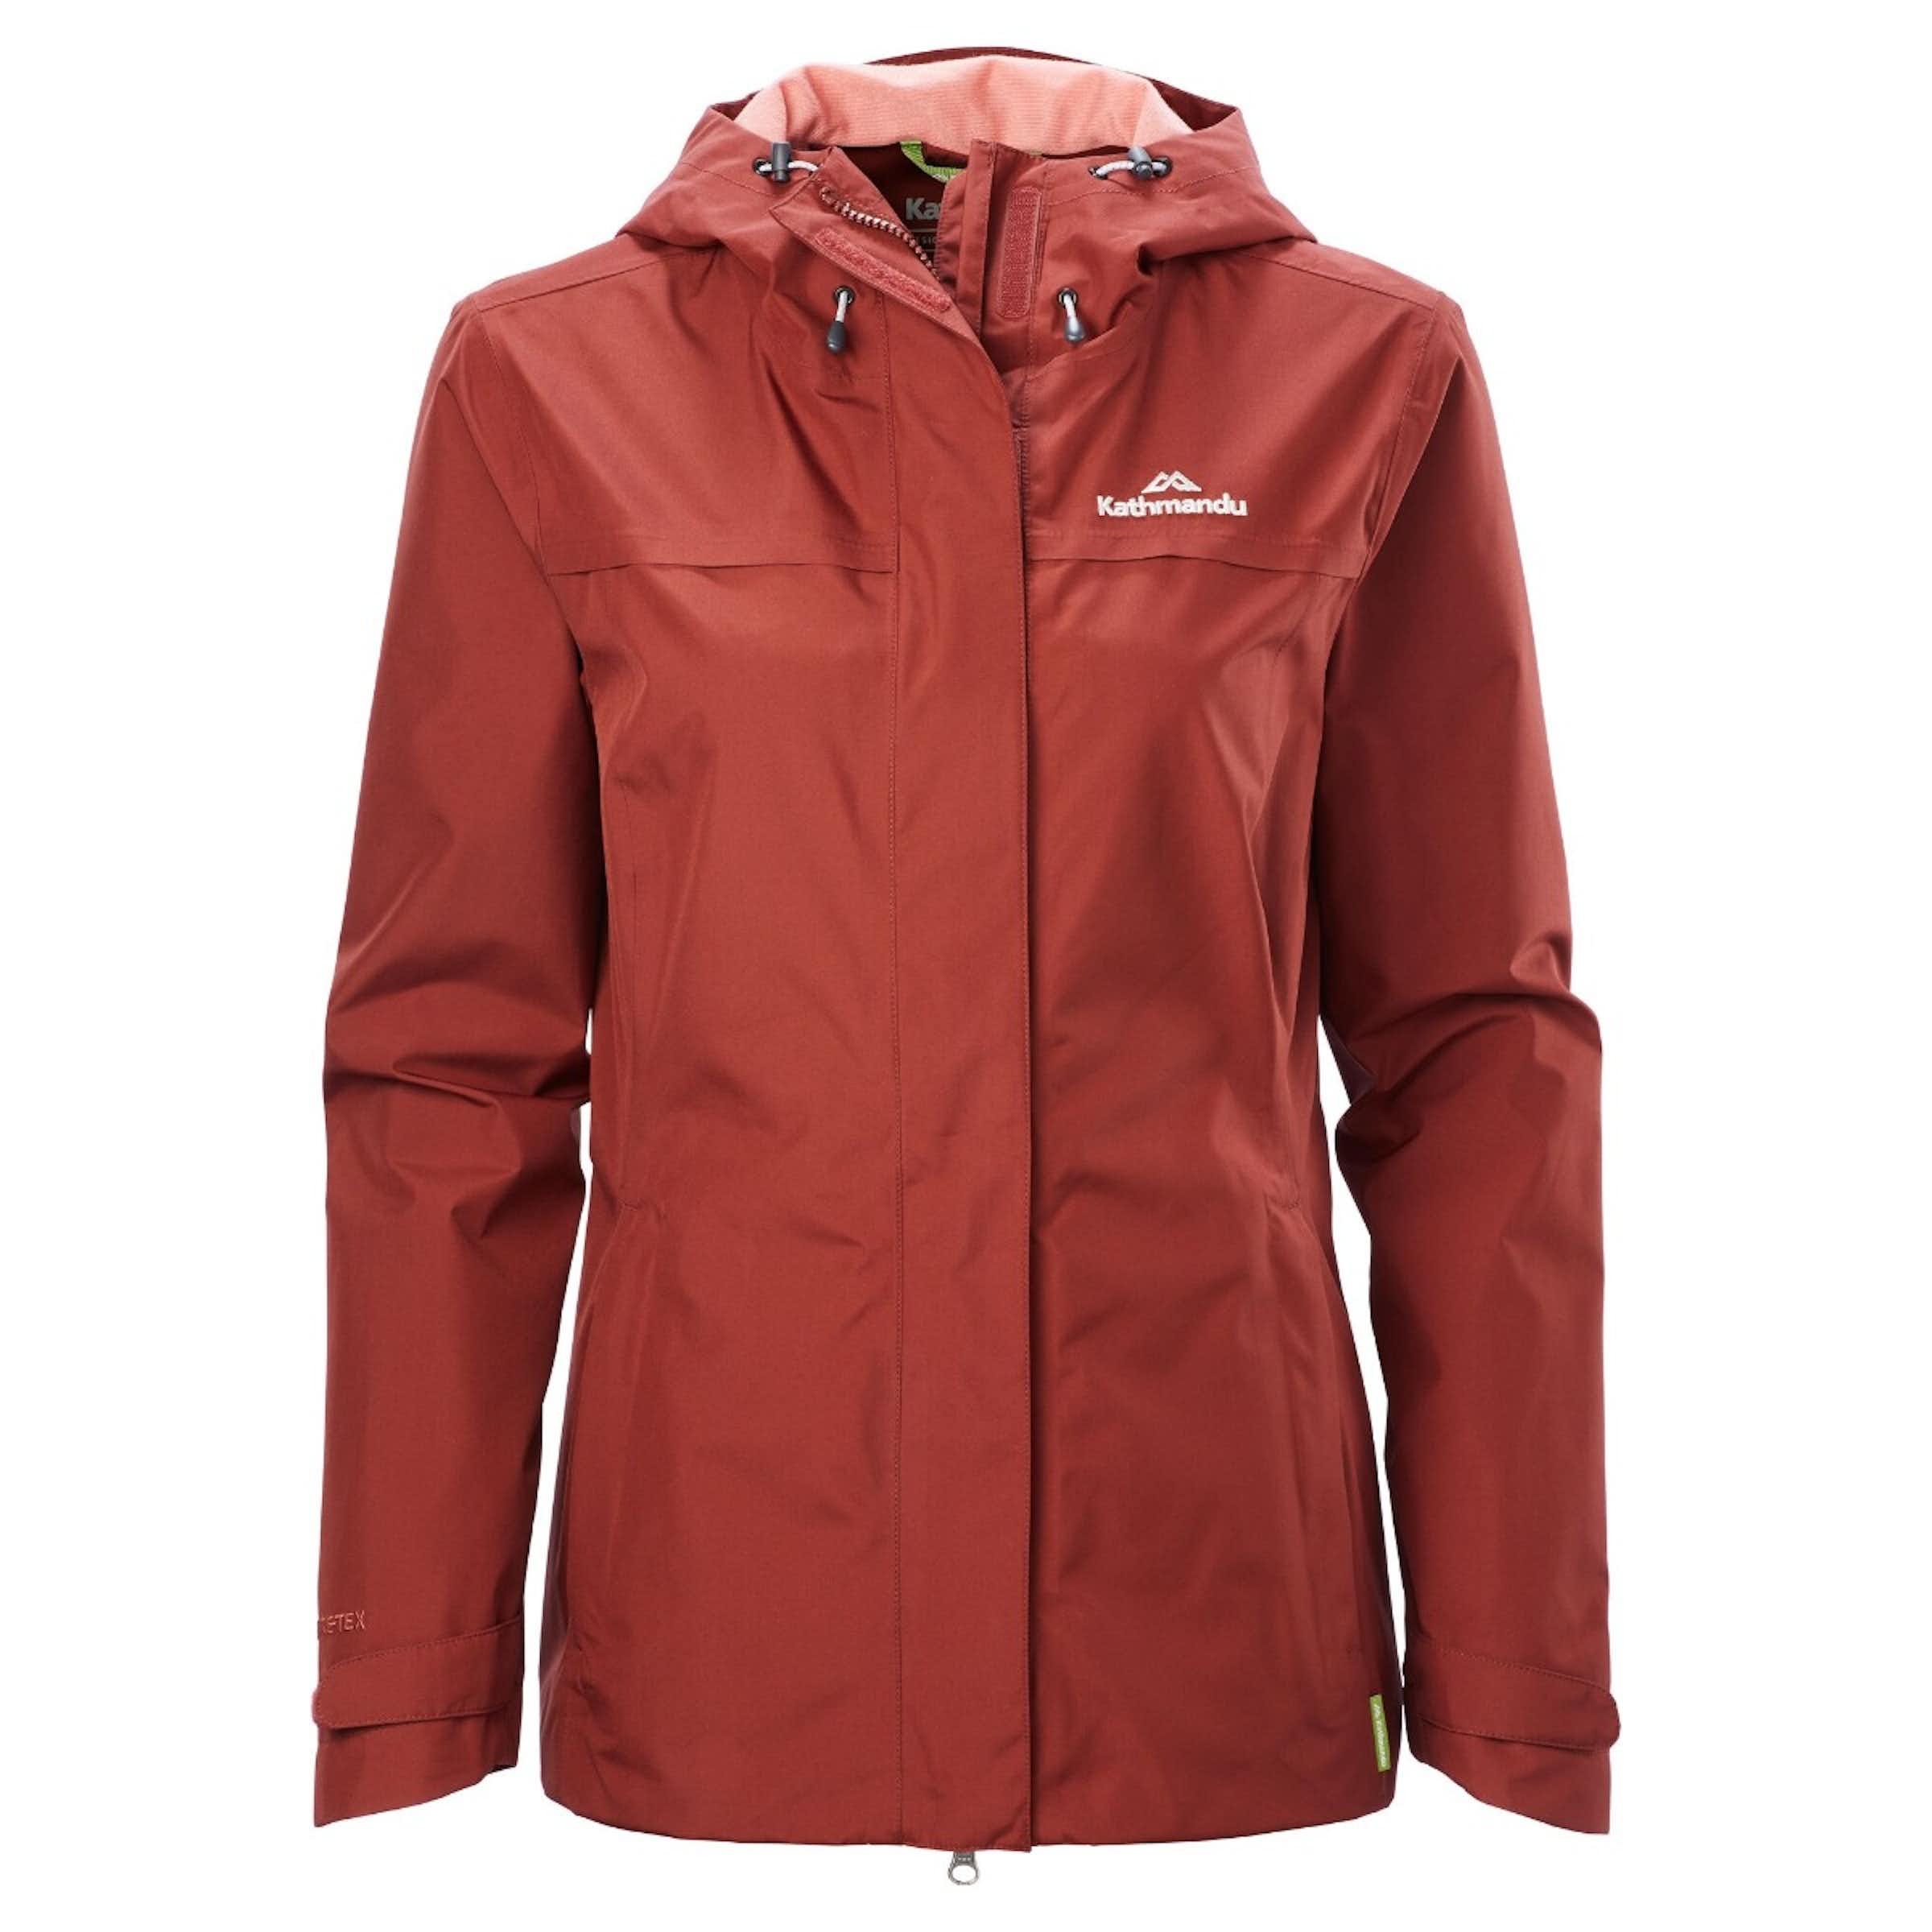 info for ee969 6f549 Womens Jackets & Coats | Winter Coats for Women | Kathmandu AU